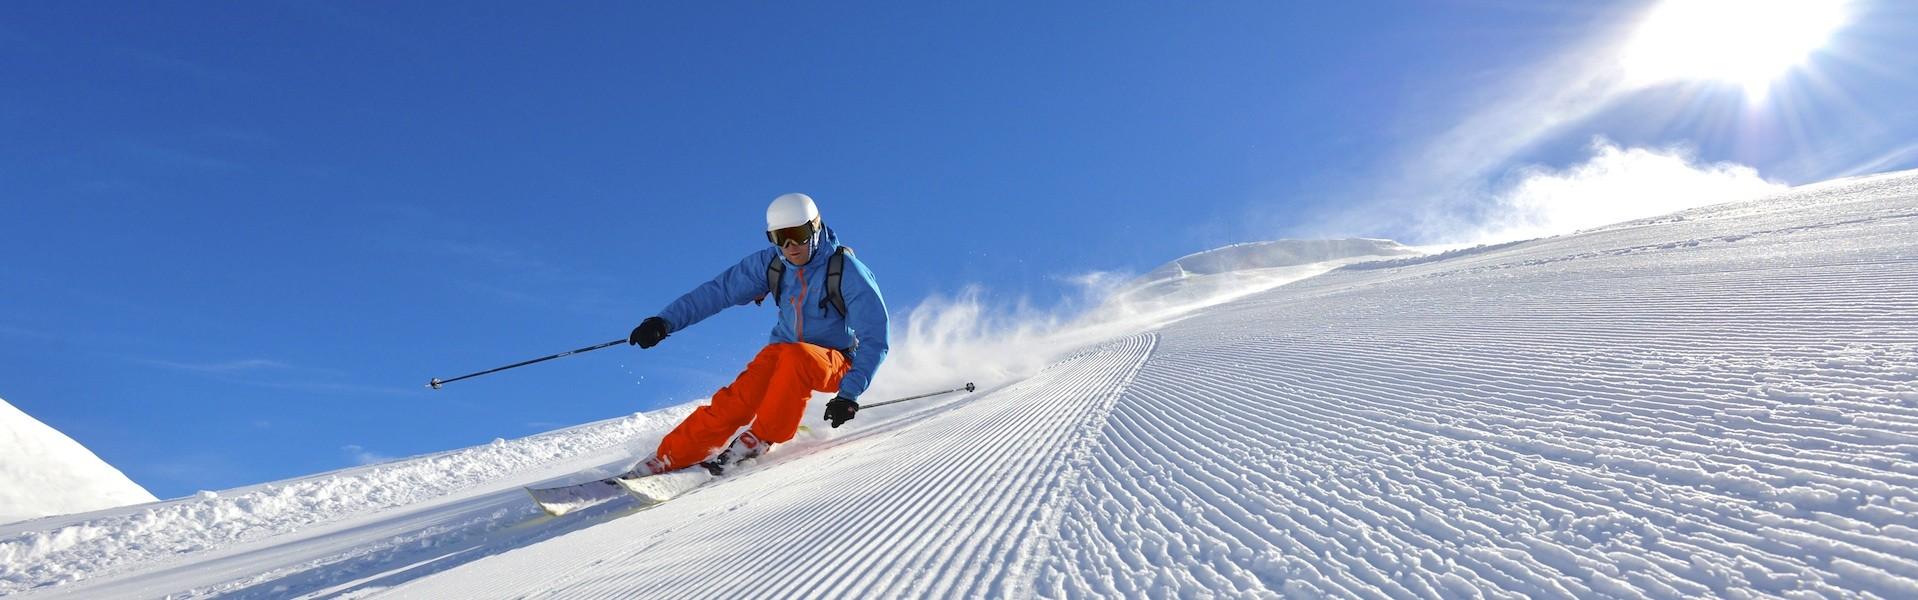 ski-david-machet-2468